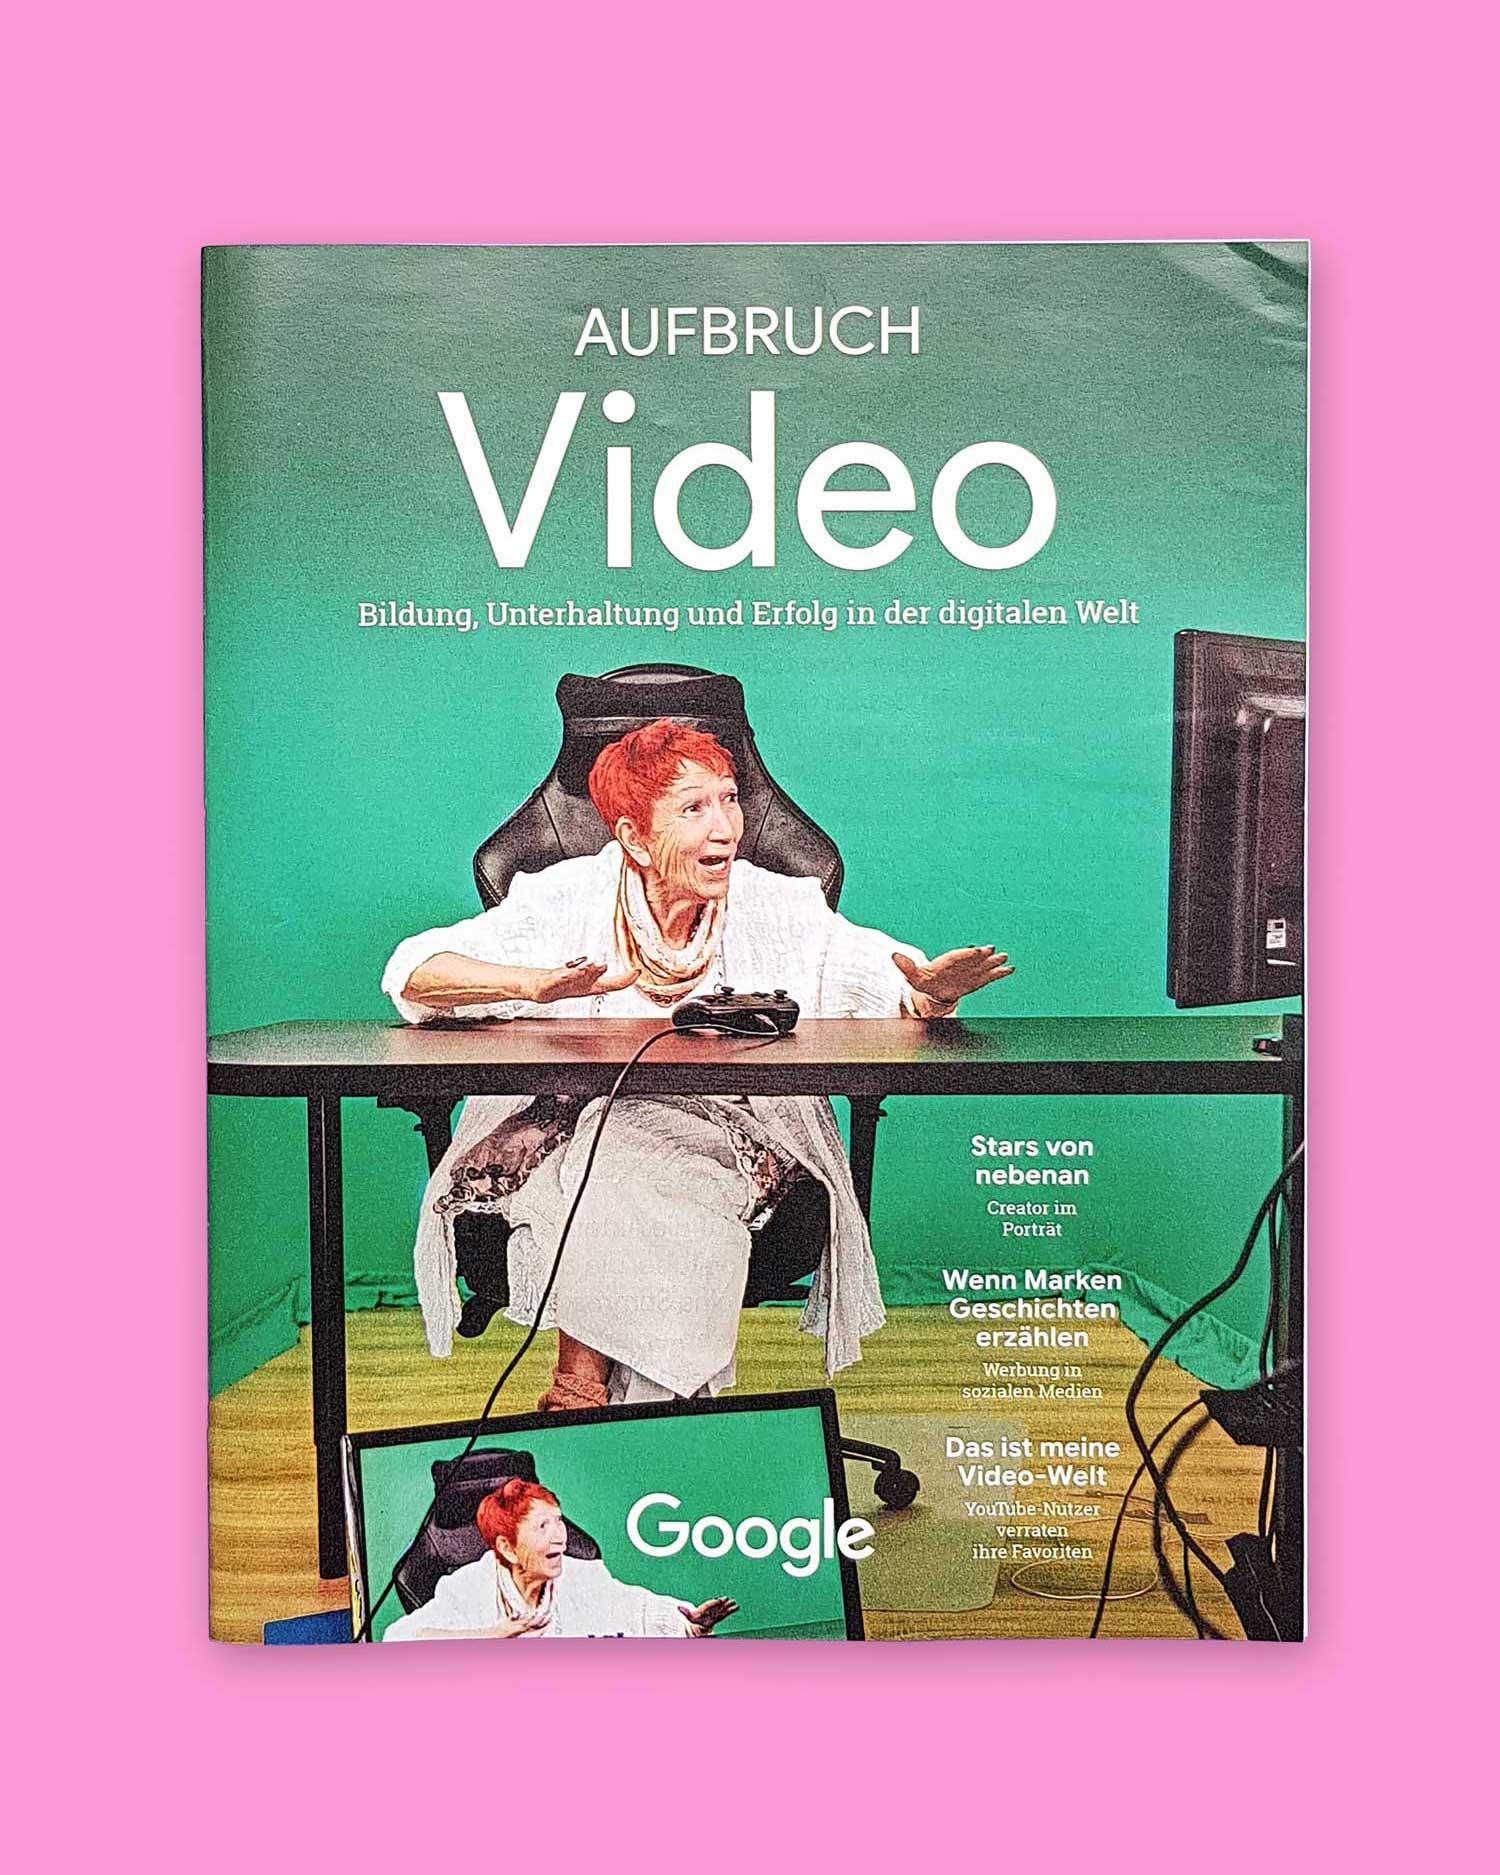 google_video_6_web_lisategtmeier.jpg